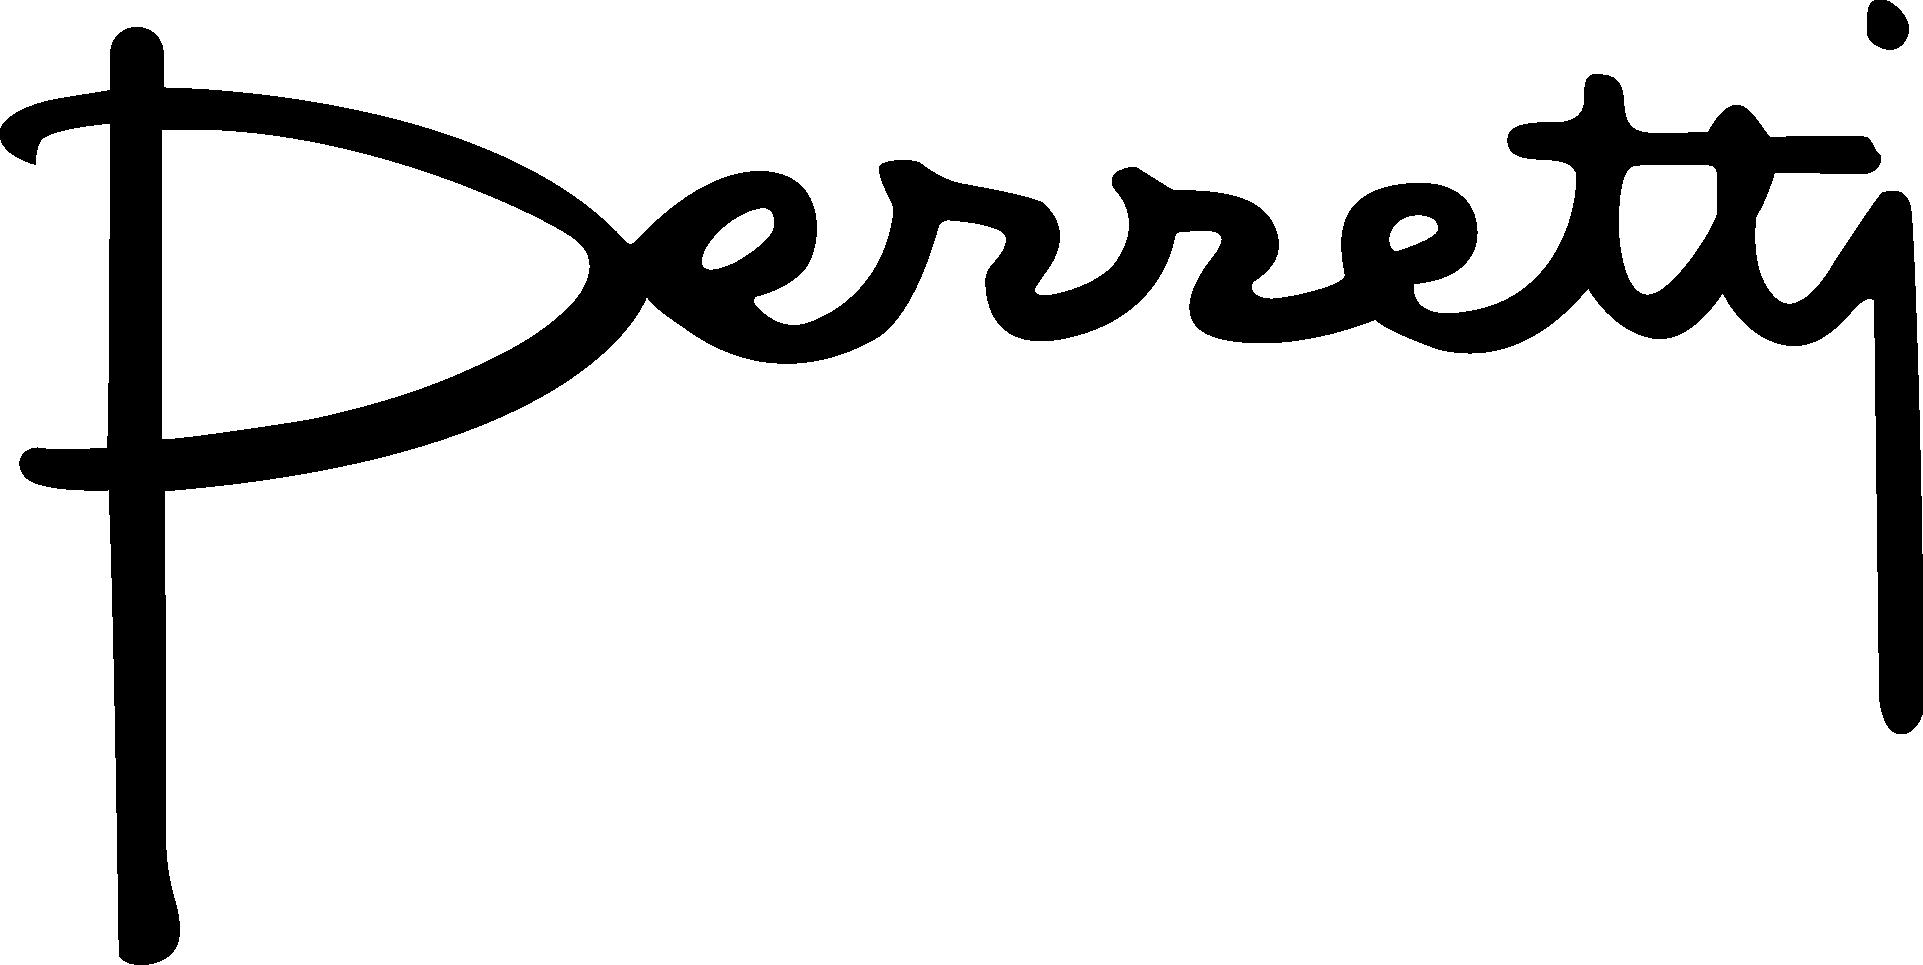 jacquesperretti